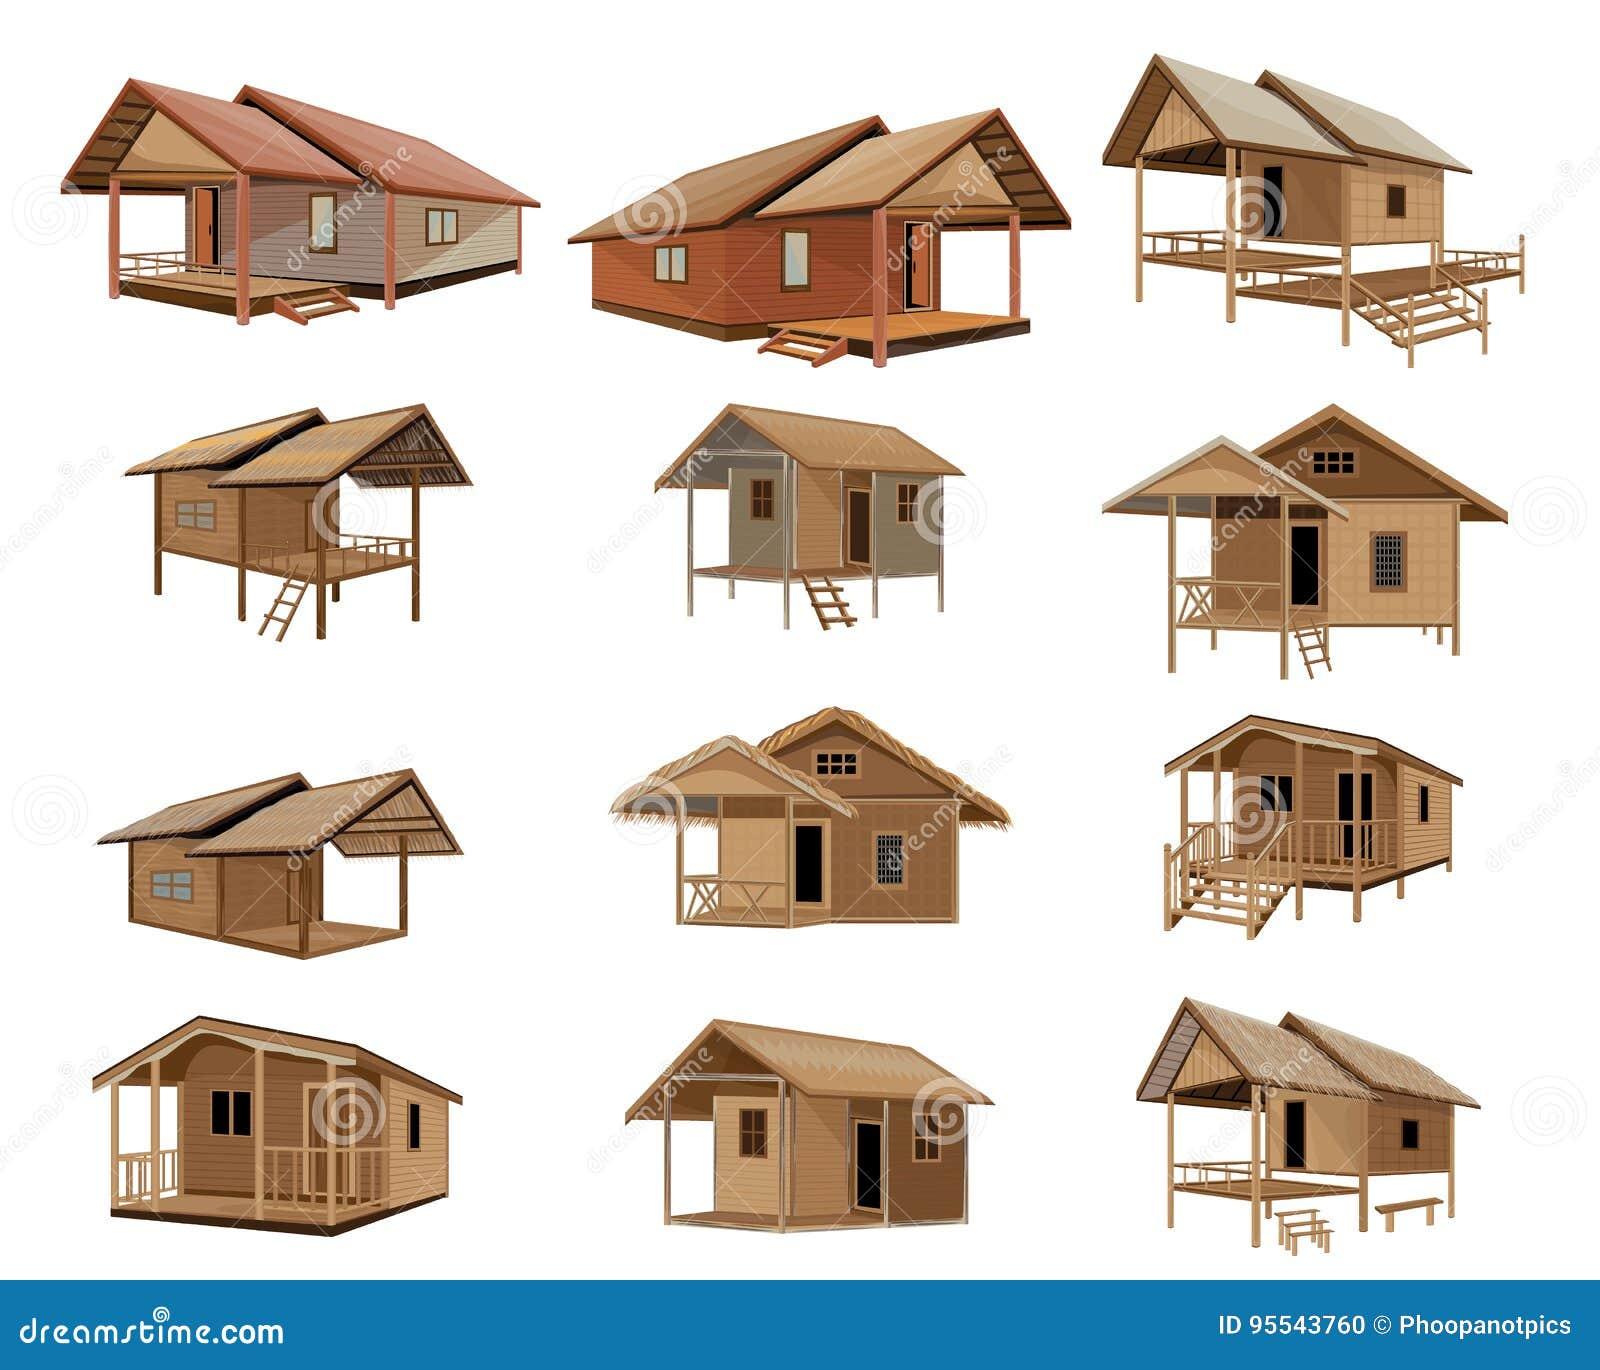 Hut Design: Hut Design Stock Vector. Illustration Of House, Home